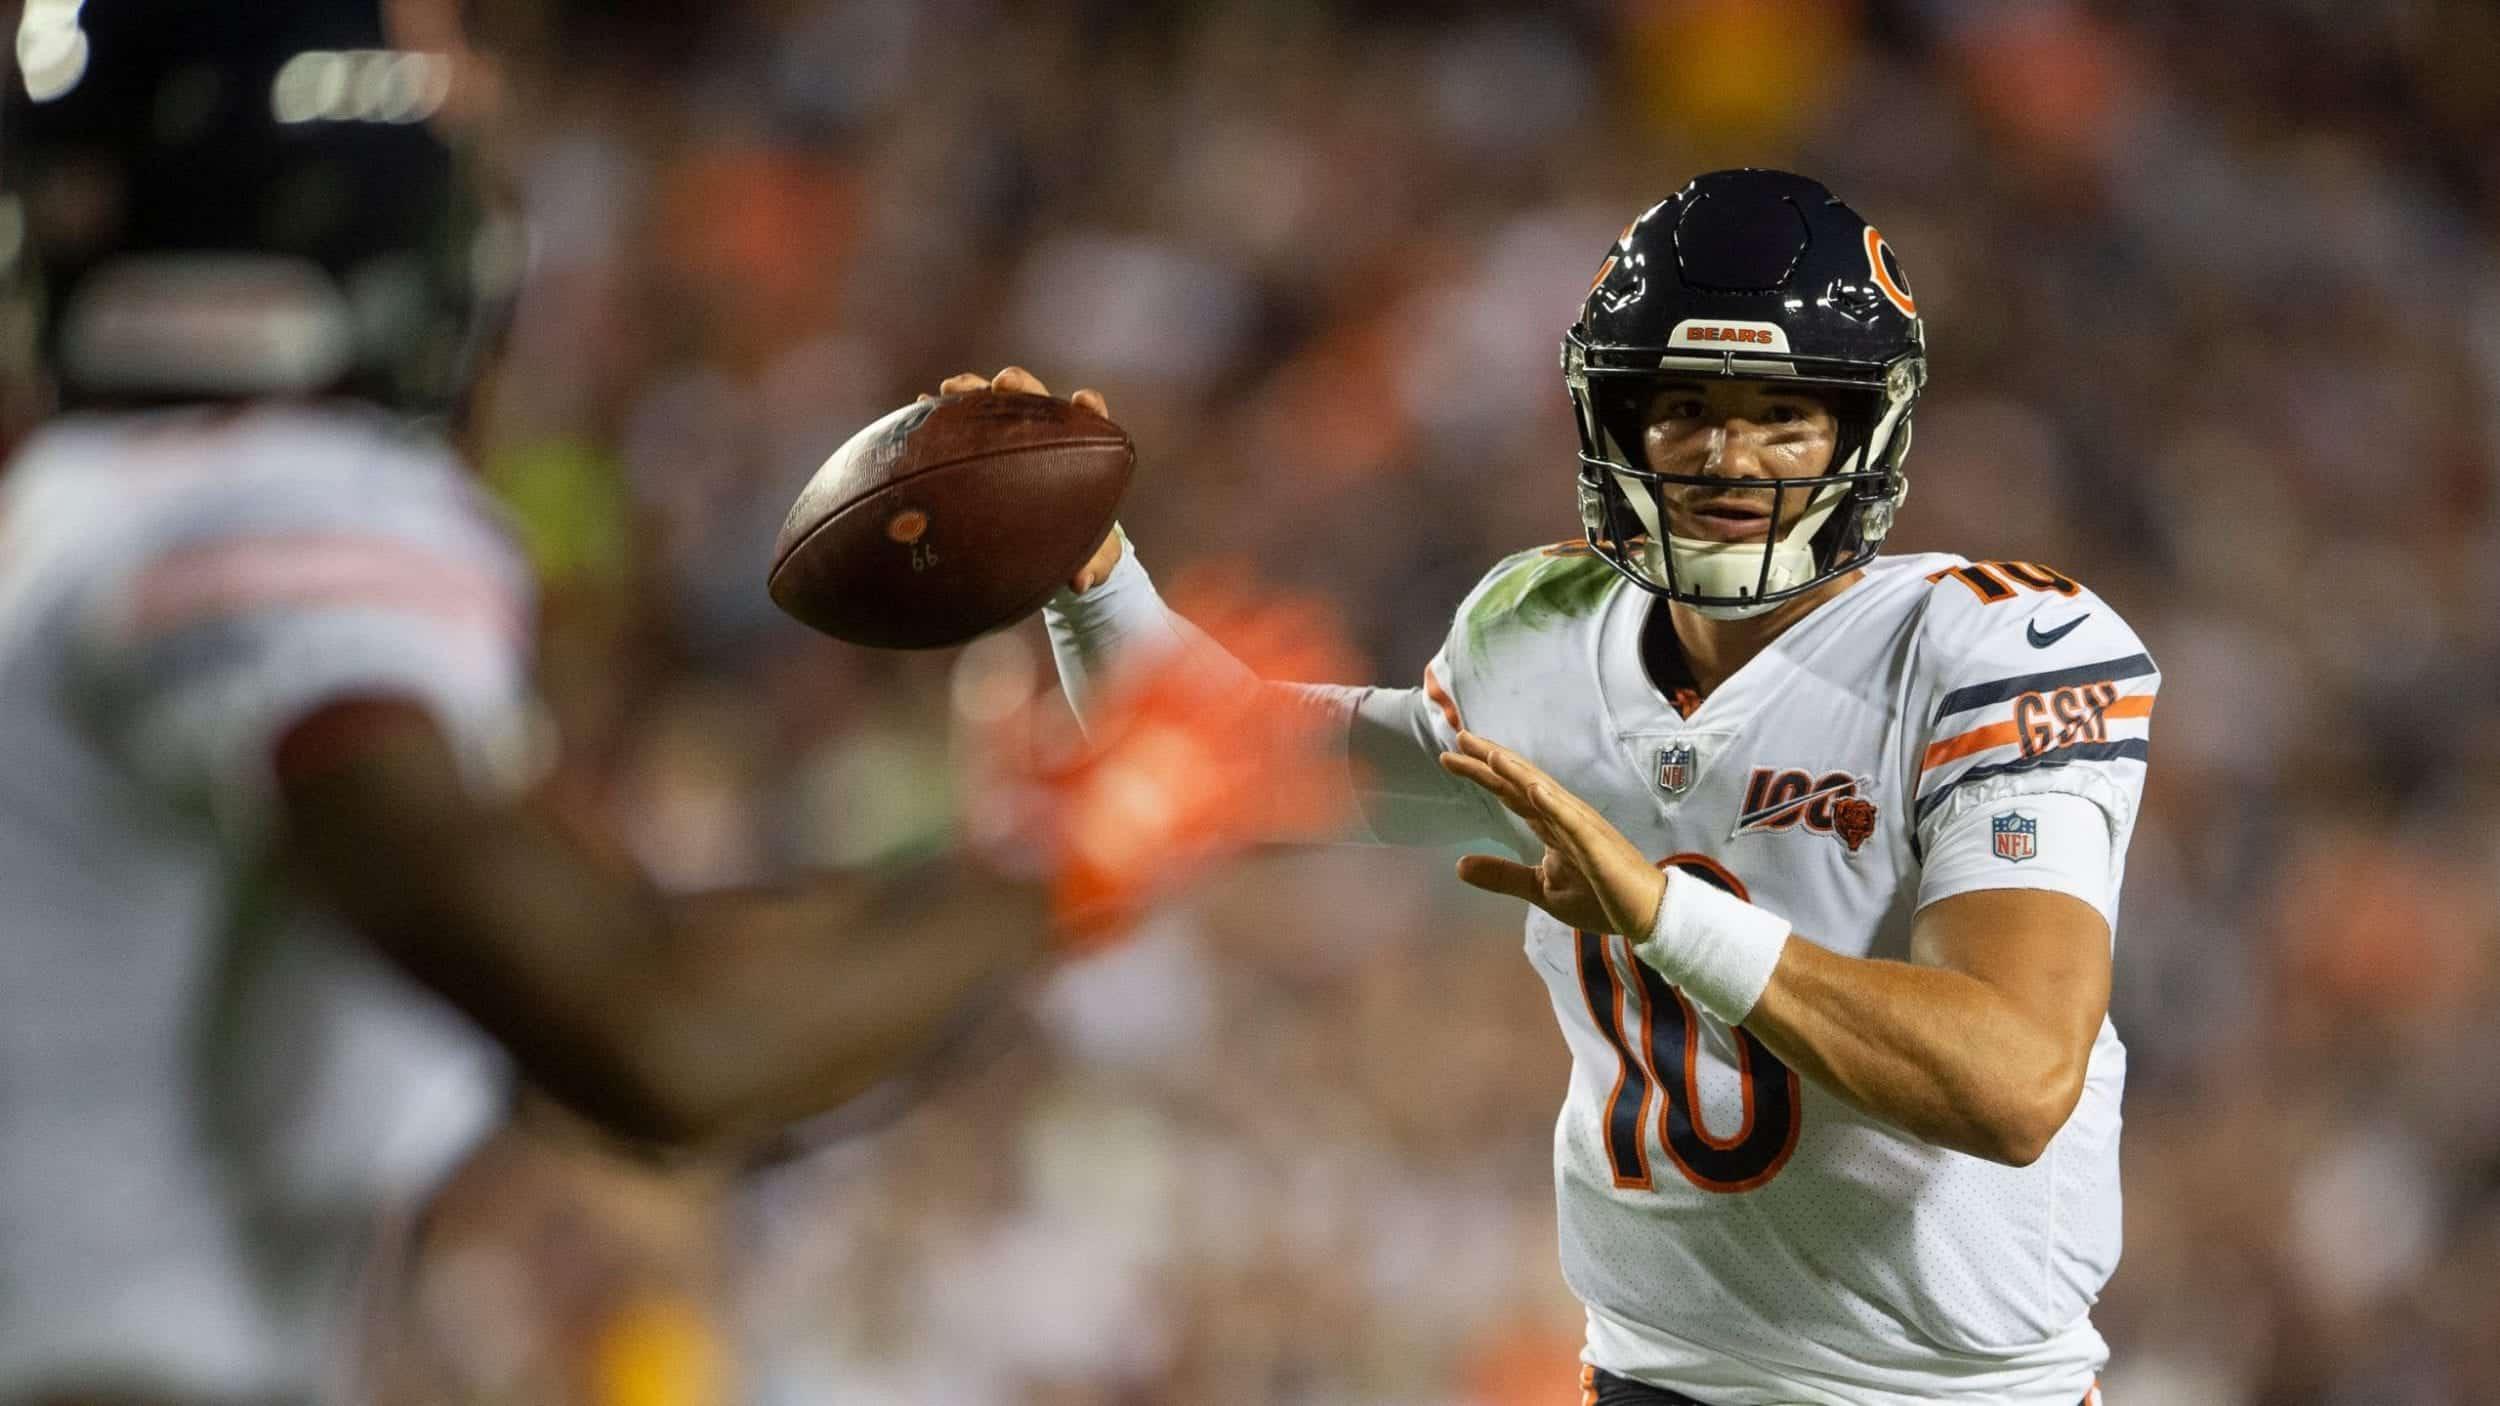 Can Chicago Bears QB Mitchell Trubisky be a franchise quarterback?